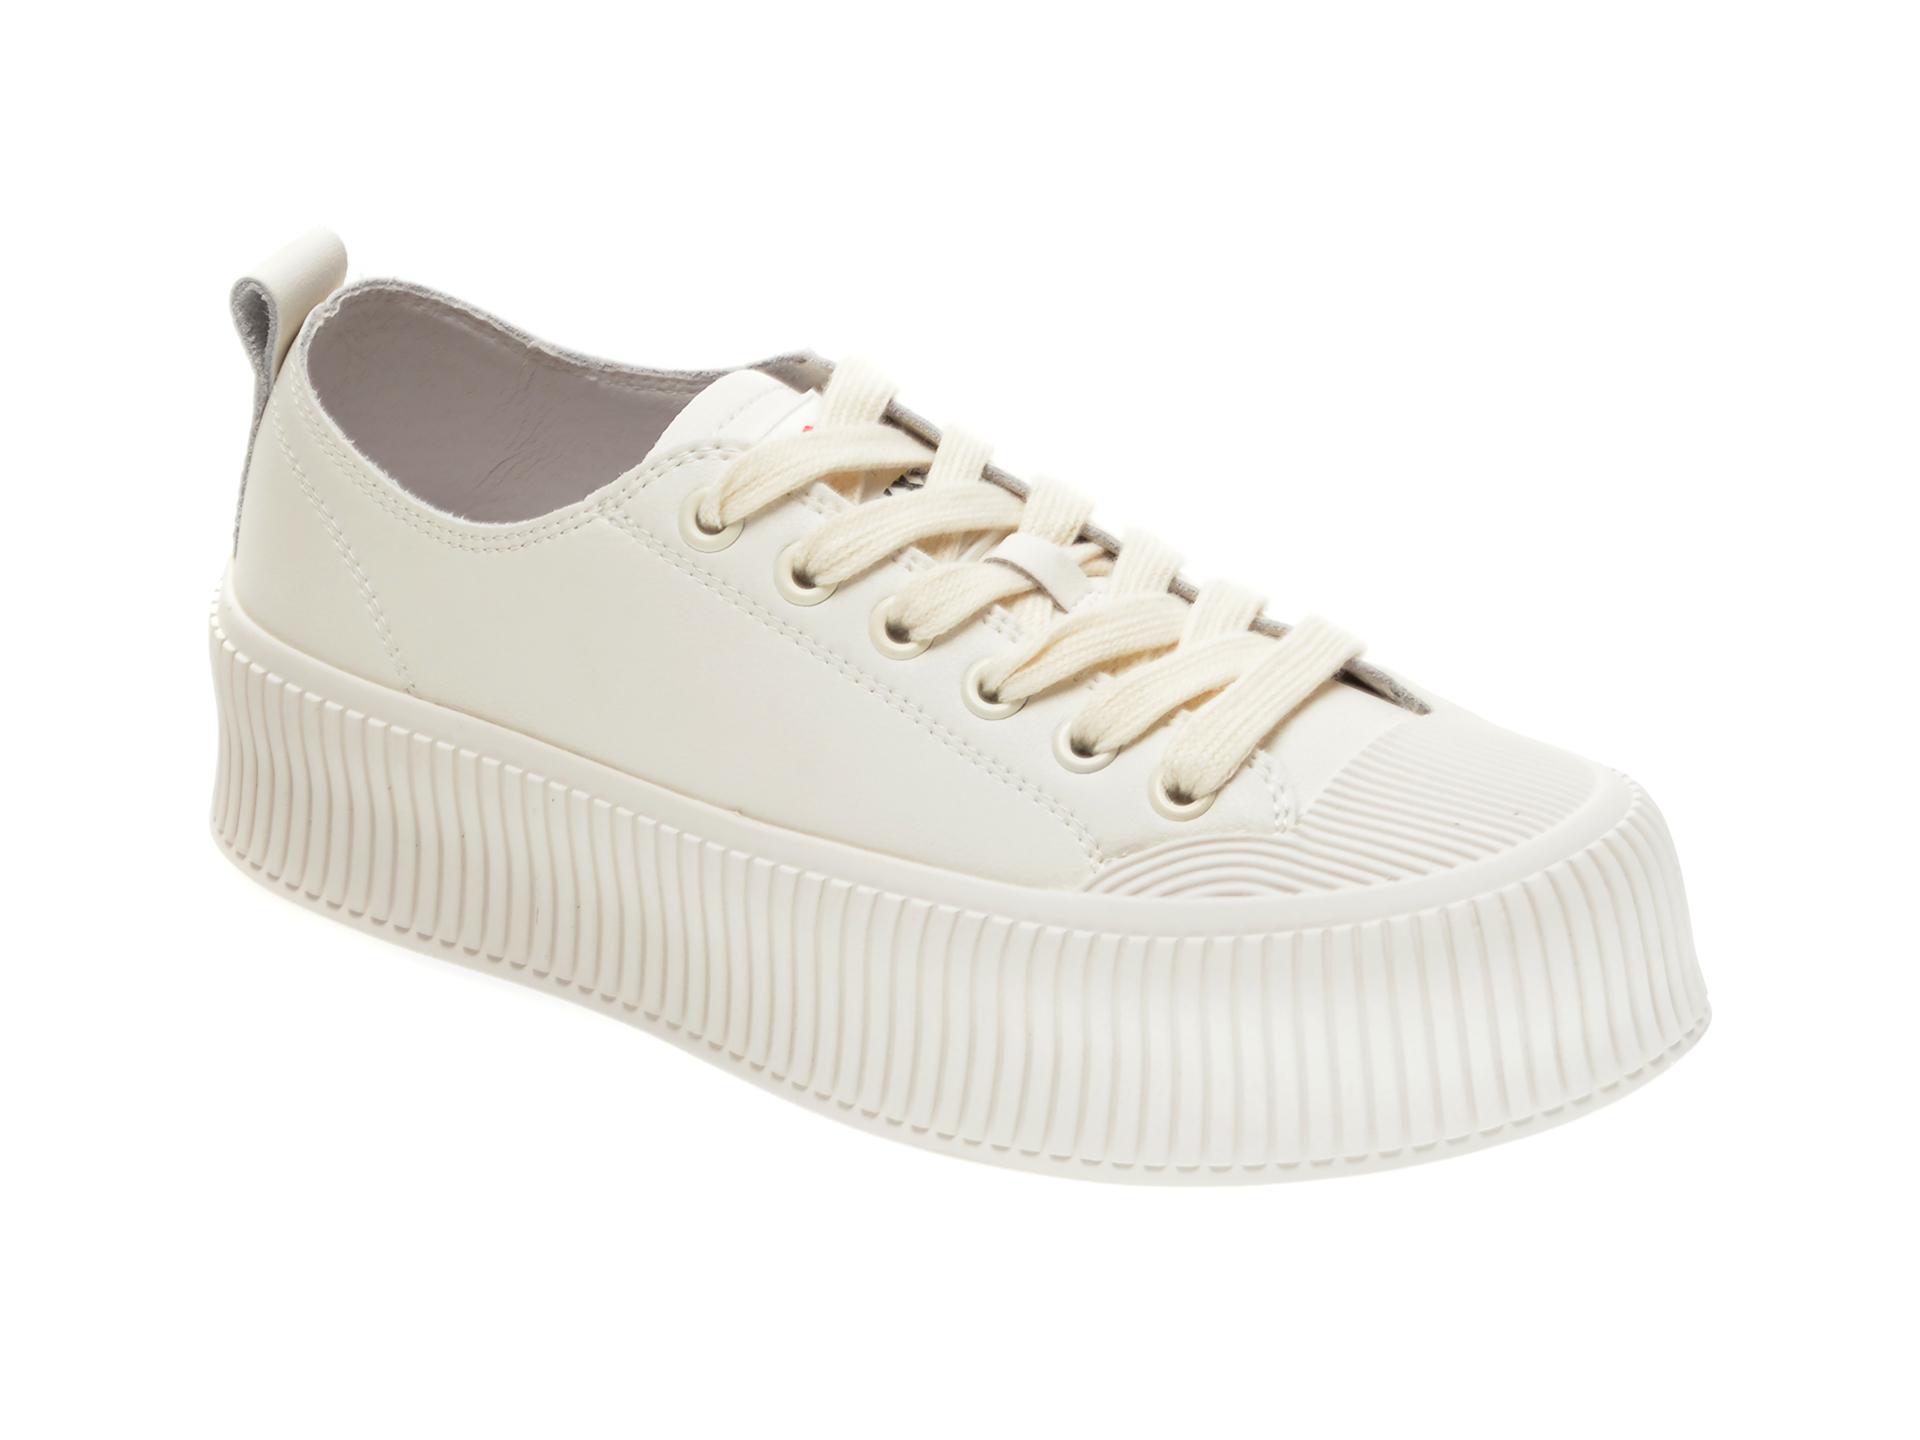 Pantofi sport GRYXX albi, 75501, din piele naturala New